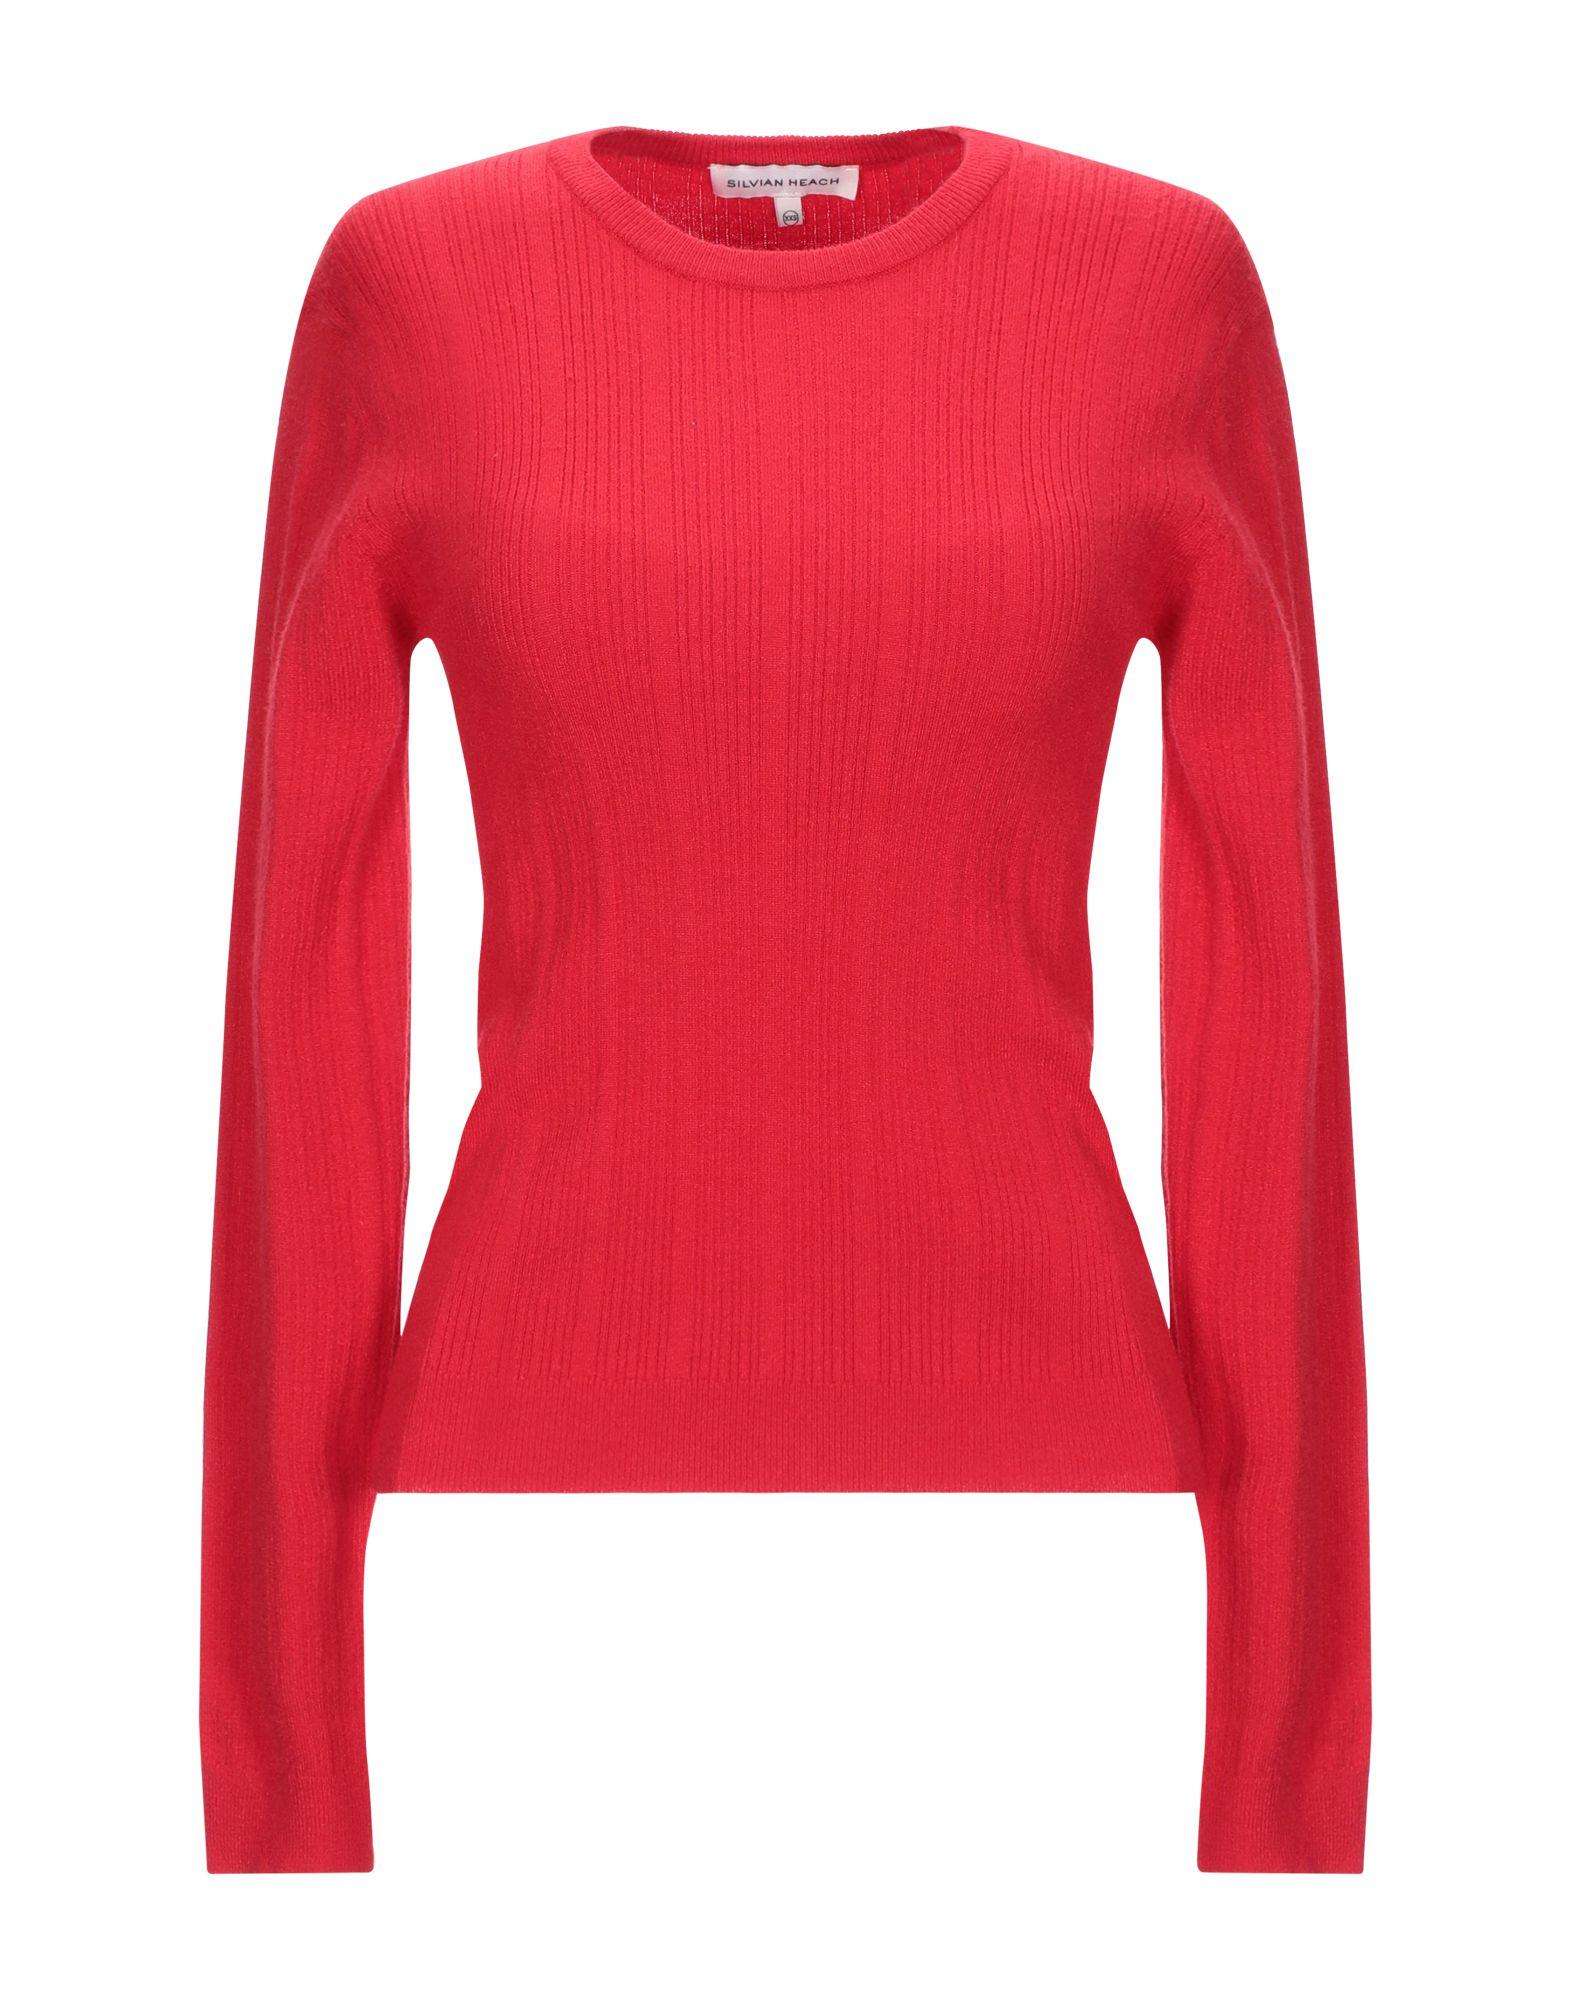 SILVIAN HEACH Свитер свитер женский silvian heach tornesa цвет светло серый pga18445ma grey light размер s 42